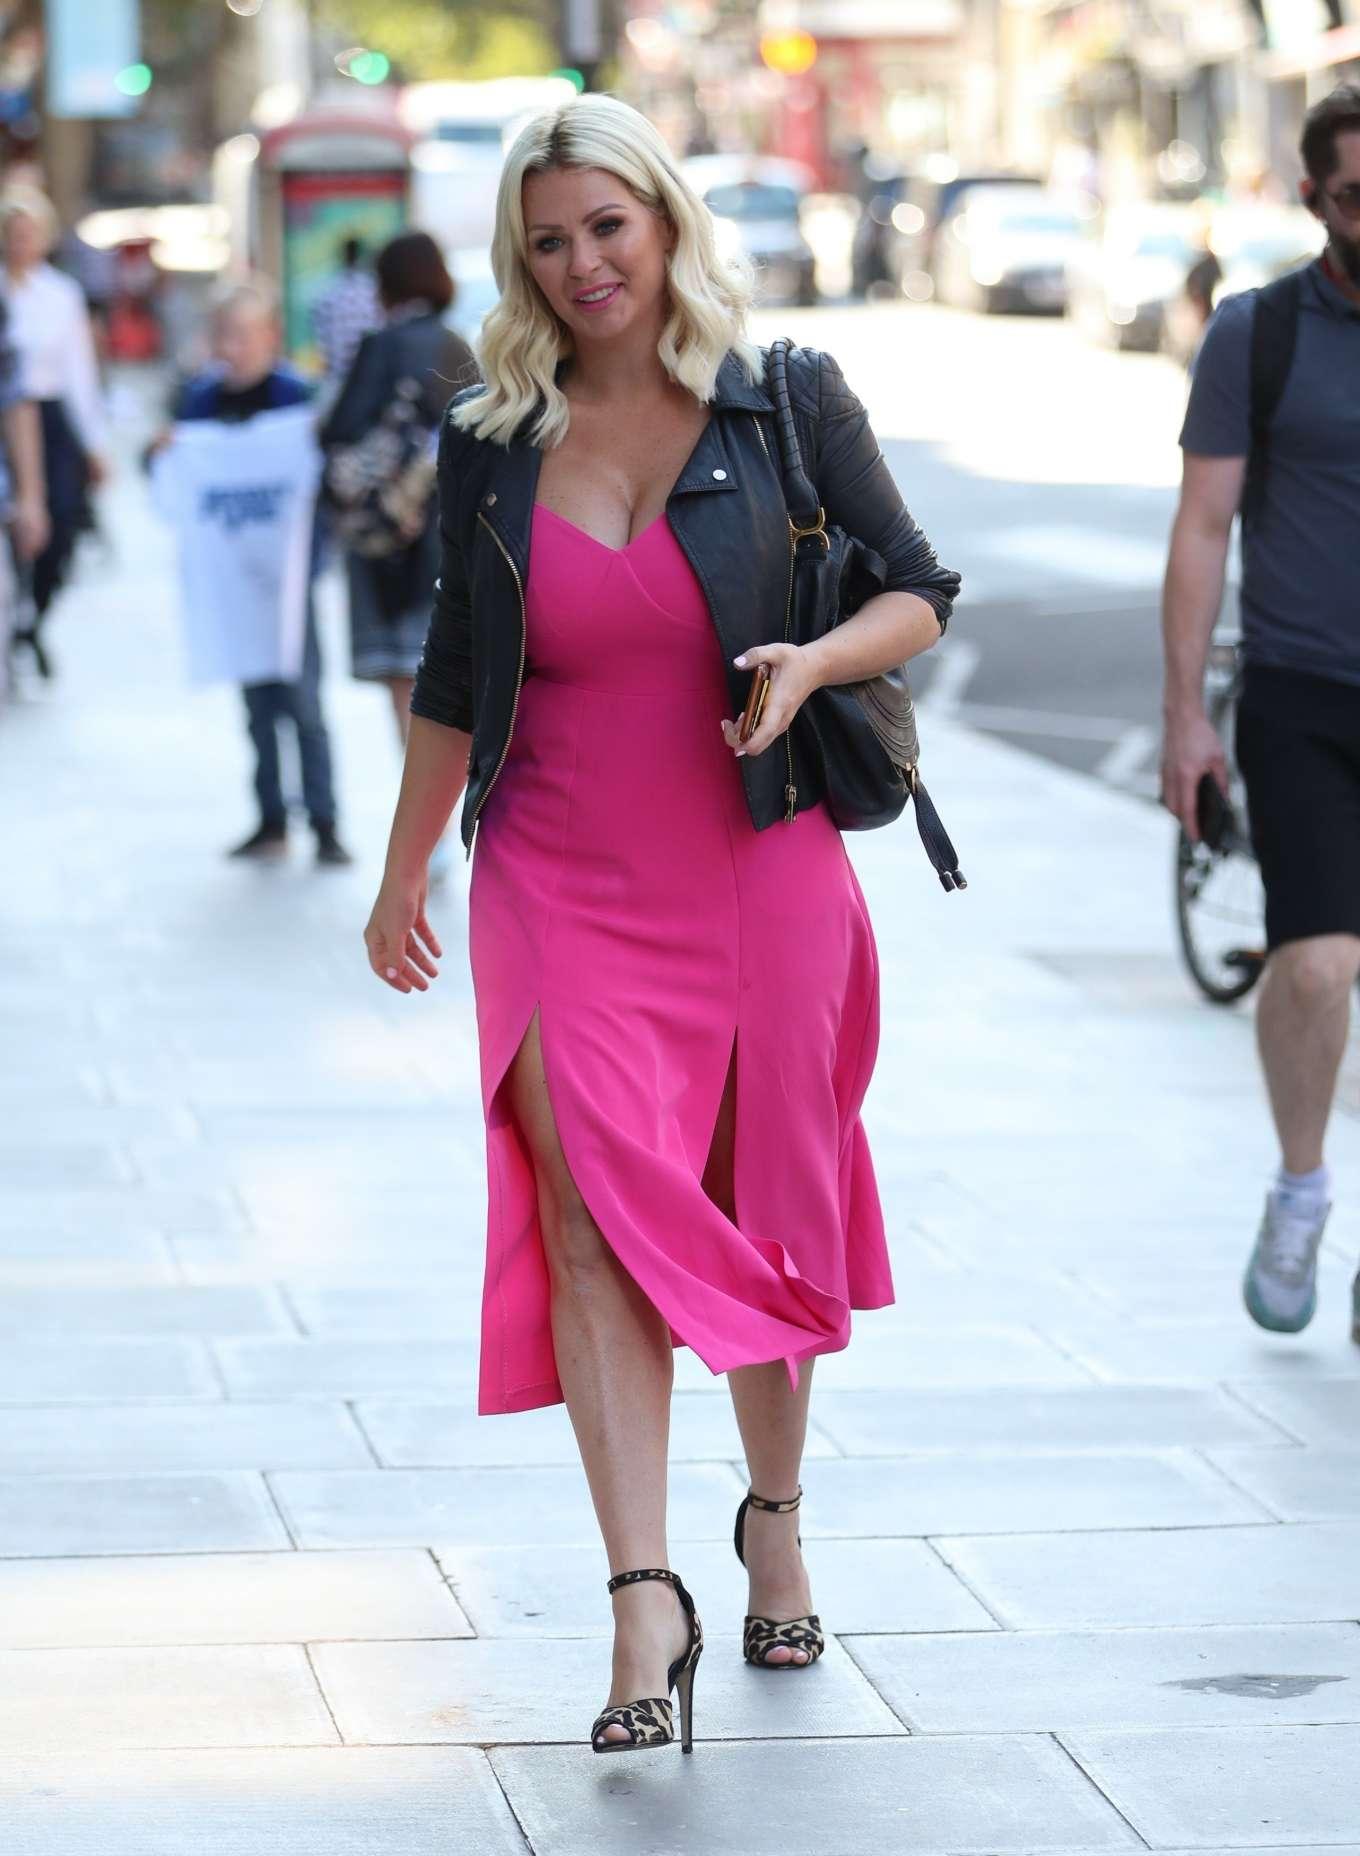 Nicola McLean 2019 : Nicola Mclean – In flirty pink dress exits Jeremy Vine show in London-12